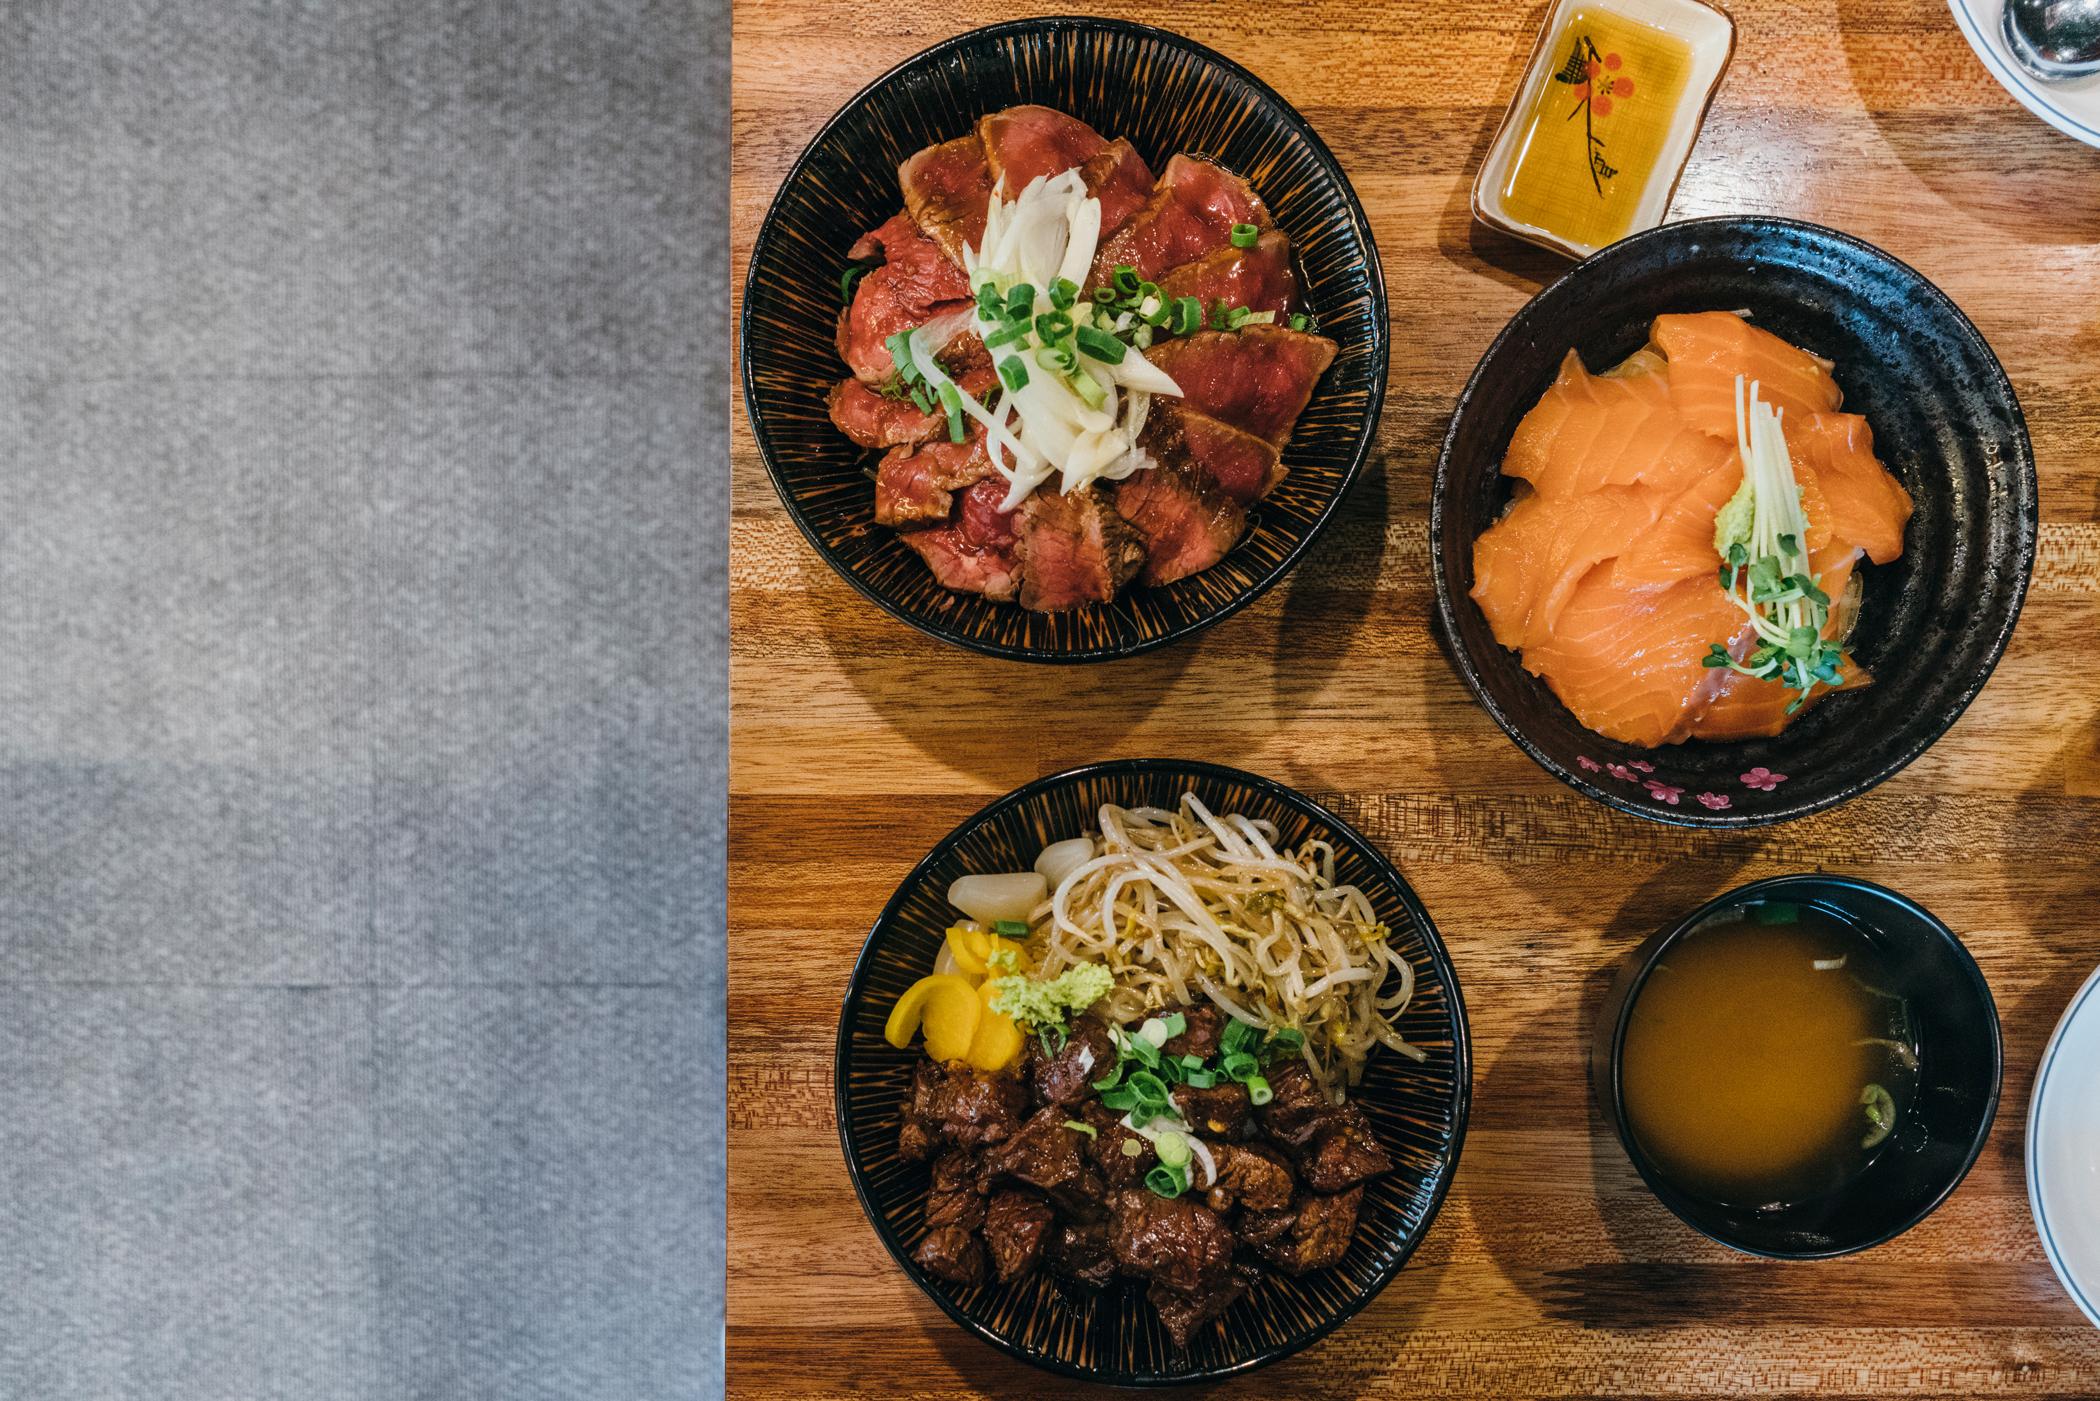 Greysuitcase in Seoul: Gaemi (고기카페개미),Sangsu (상수), South Korea.스테이크 덮밥,큐브스테이크 덮밥,연어 덮밥.